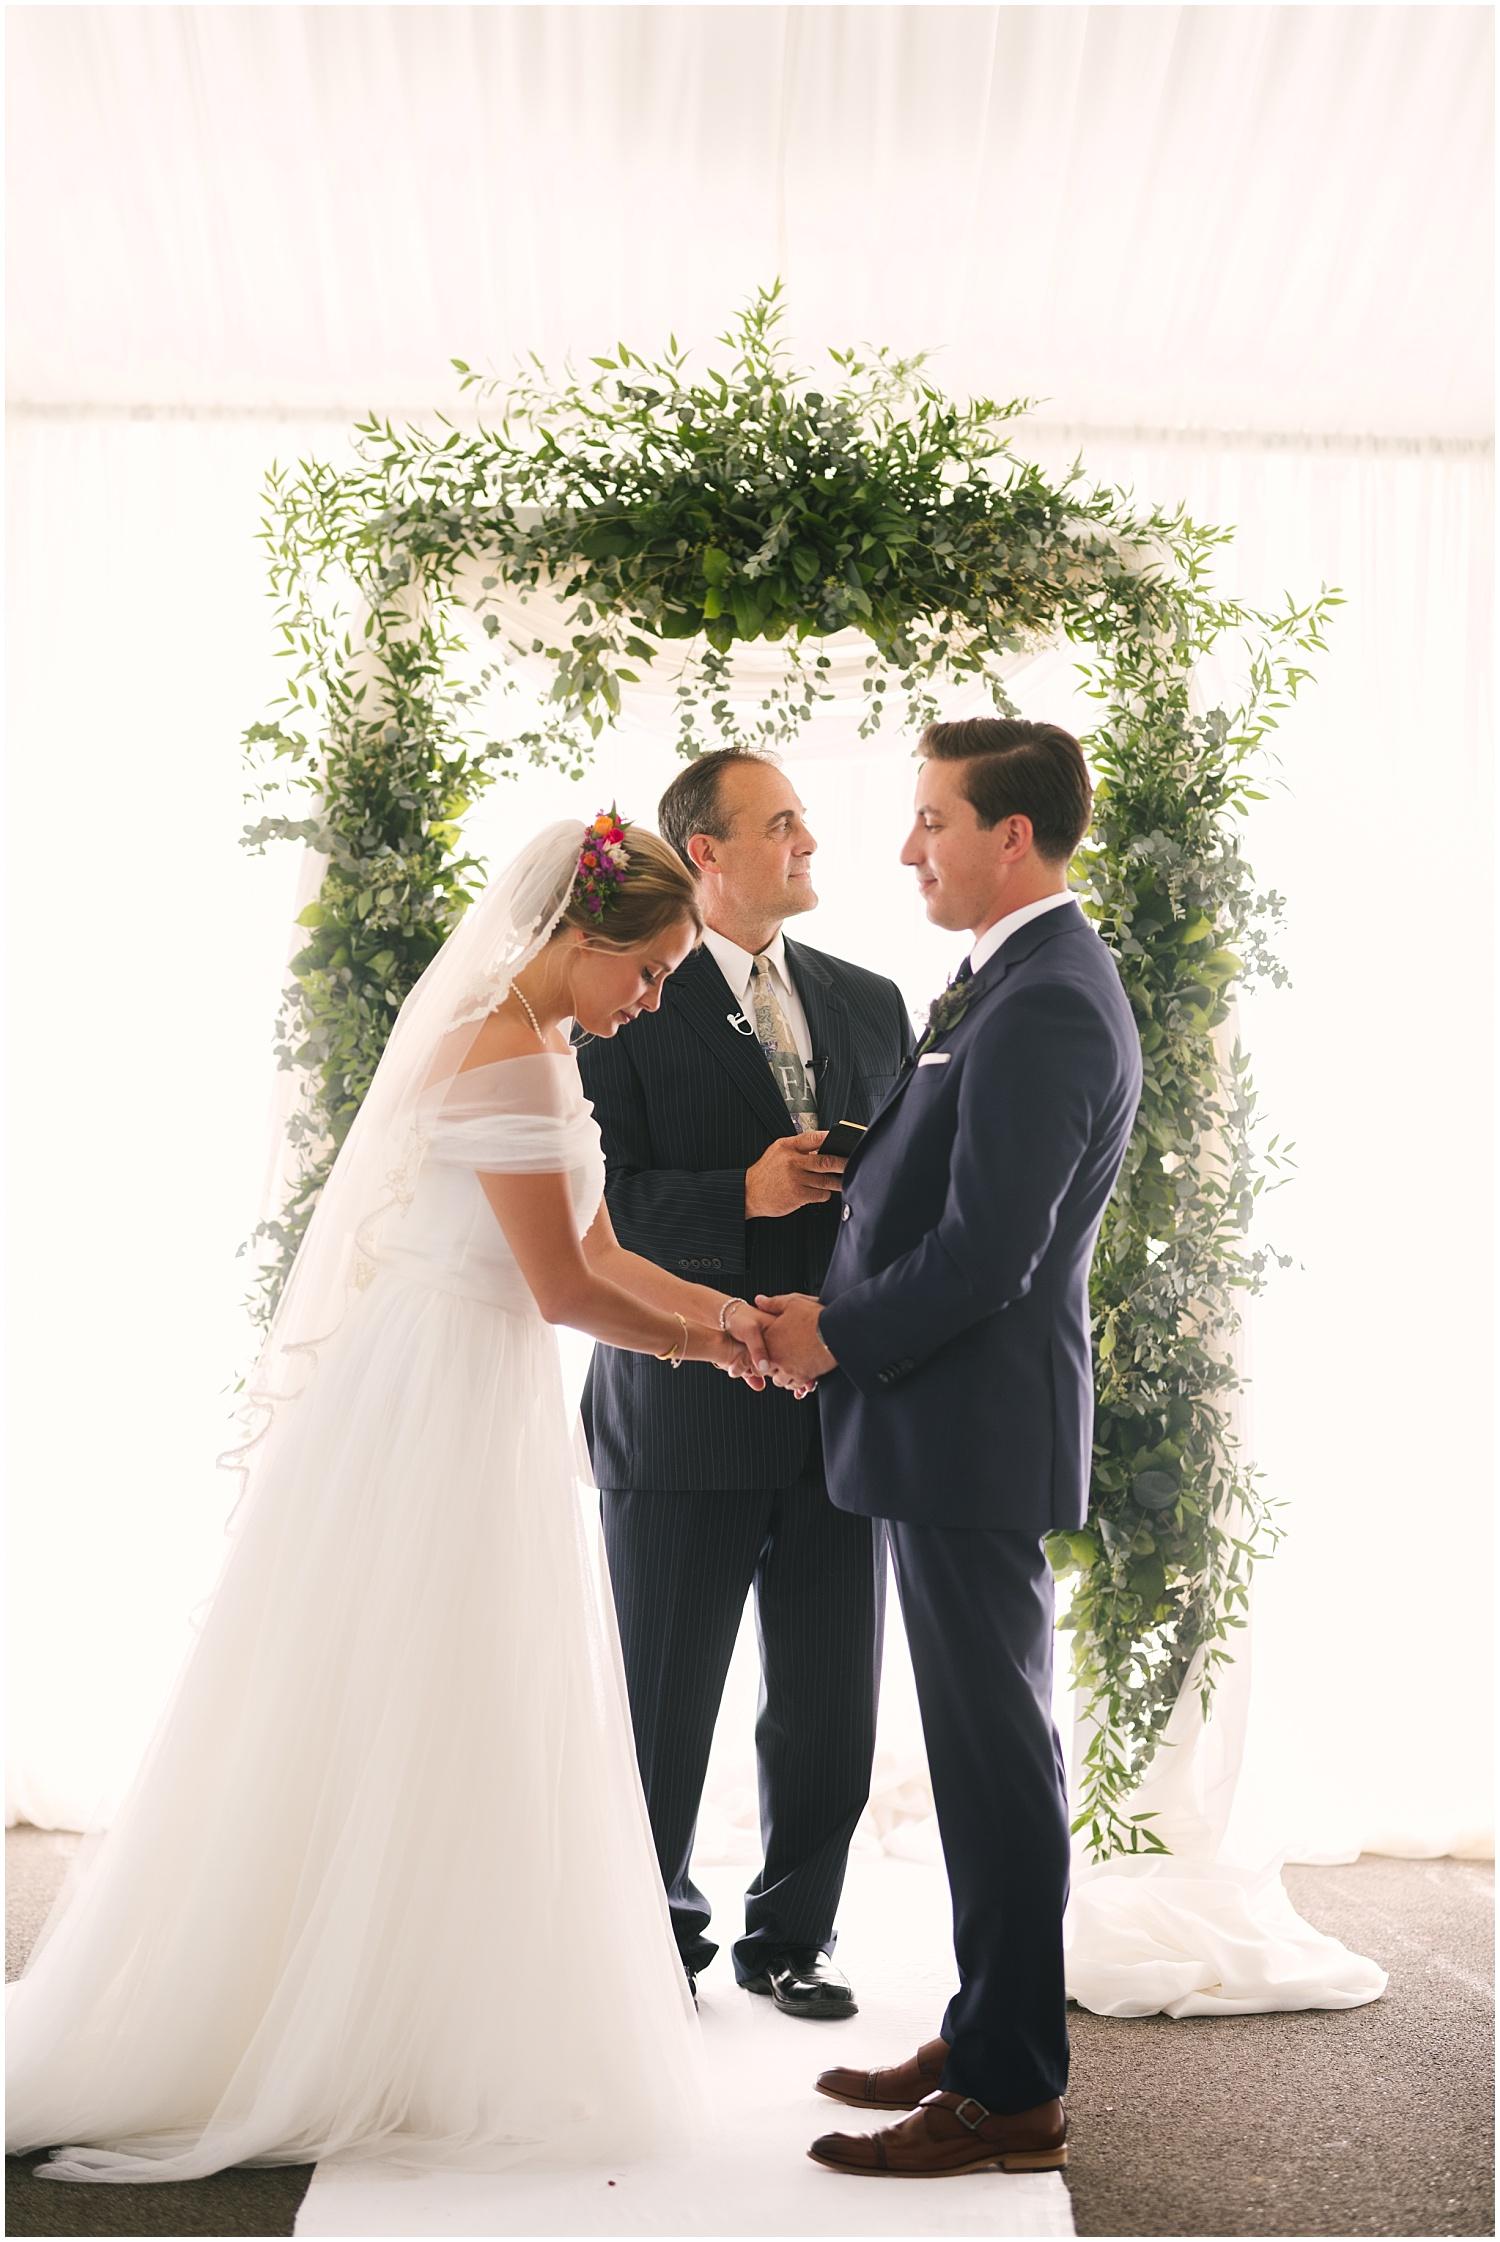 traditions+at+the+glen+wedding+binghamton+wedding (52).jpg